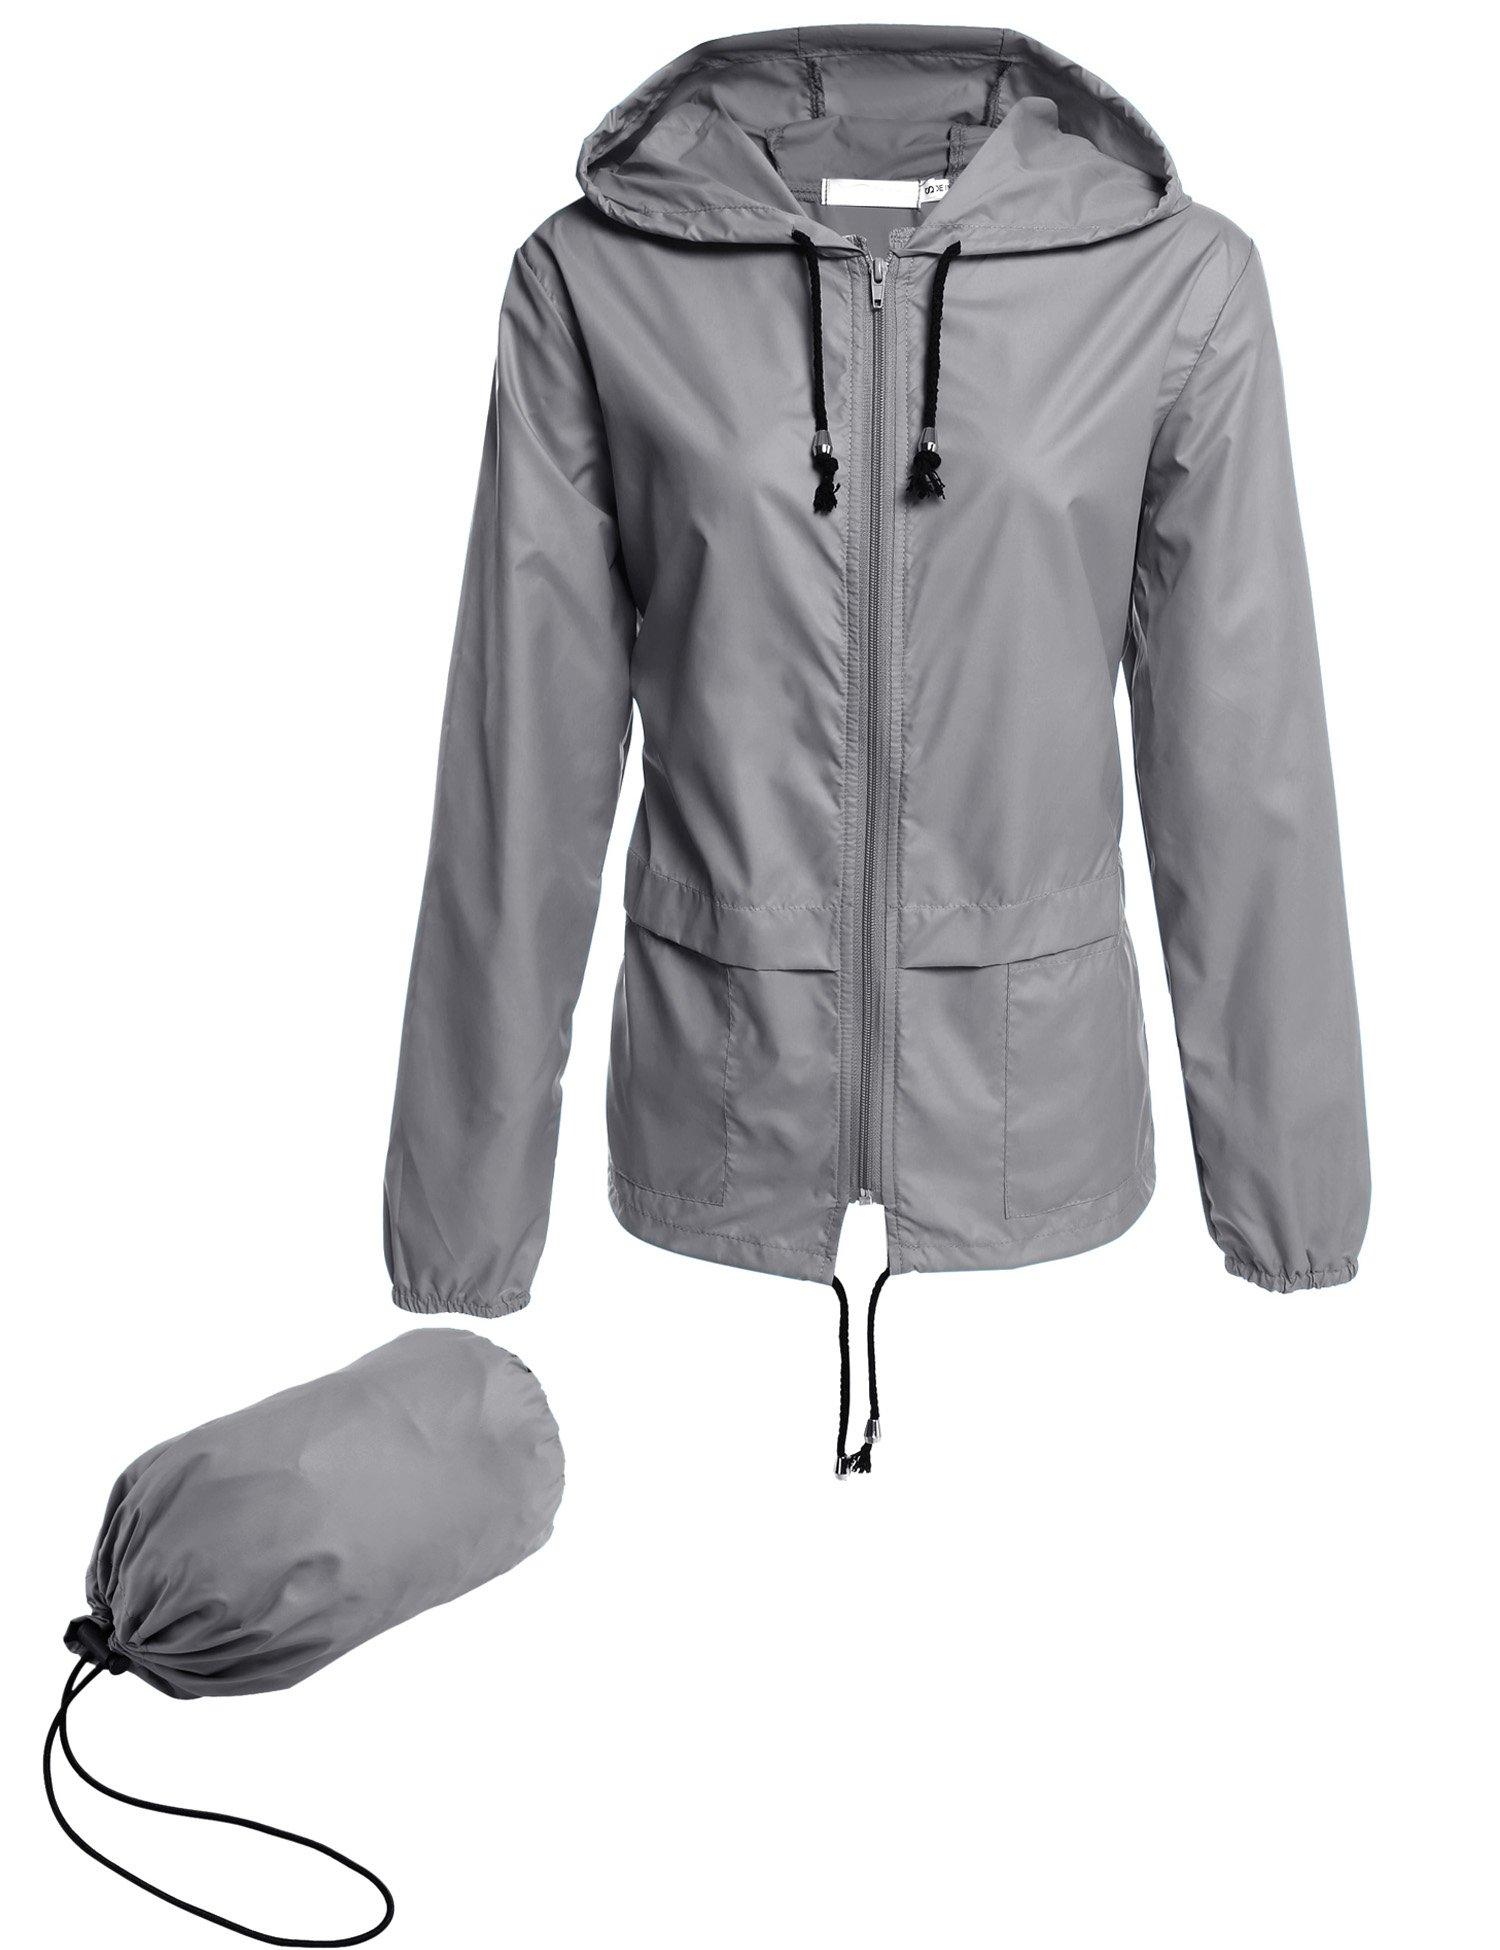 Beyove Women's Lightweight Rain Jacket Active Outdoor Waterproof Packable Hooded Raincoat by Beyove (Image #1)